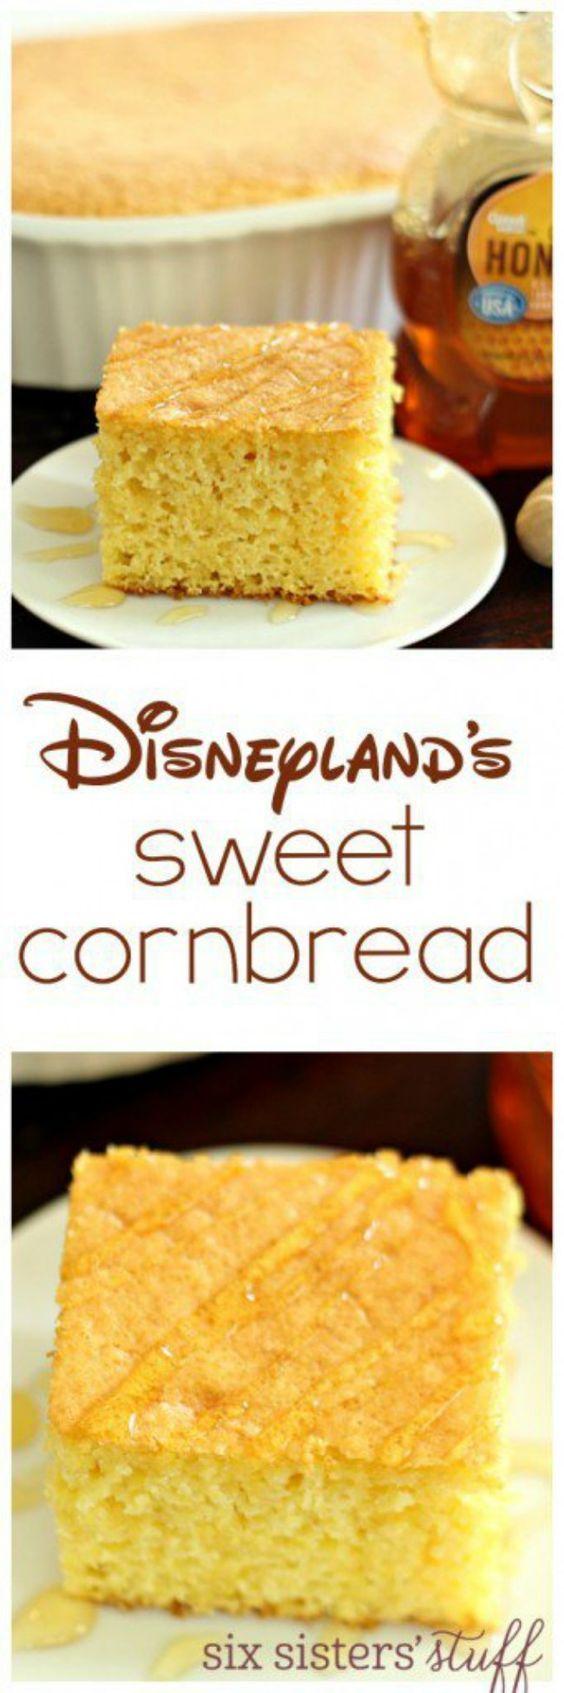 The 11 Best Disney Recipes - Disneyland's Sweet Cornbread Recipe